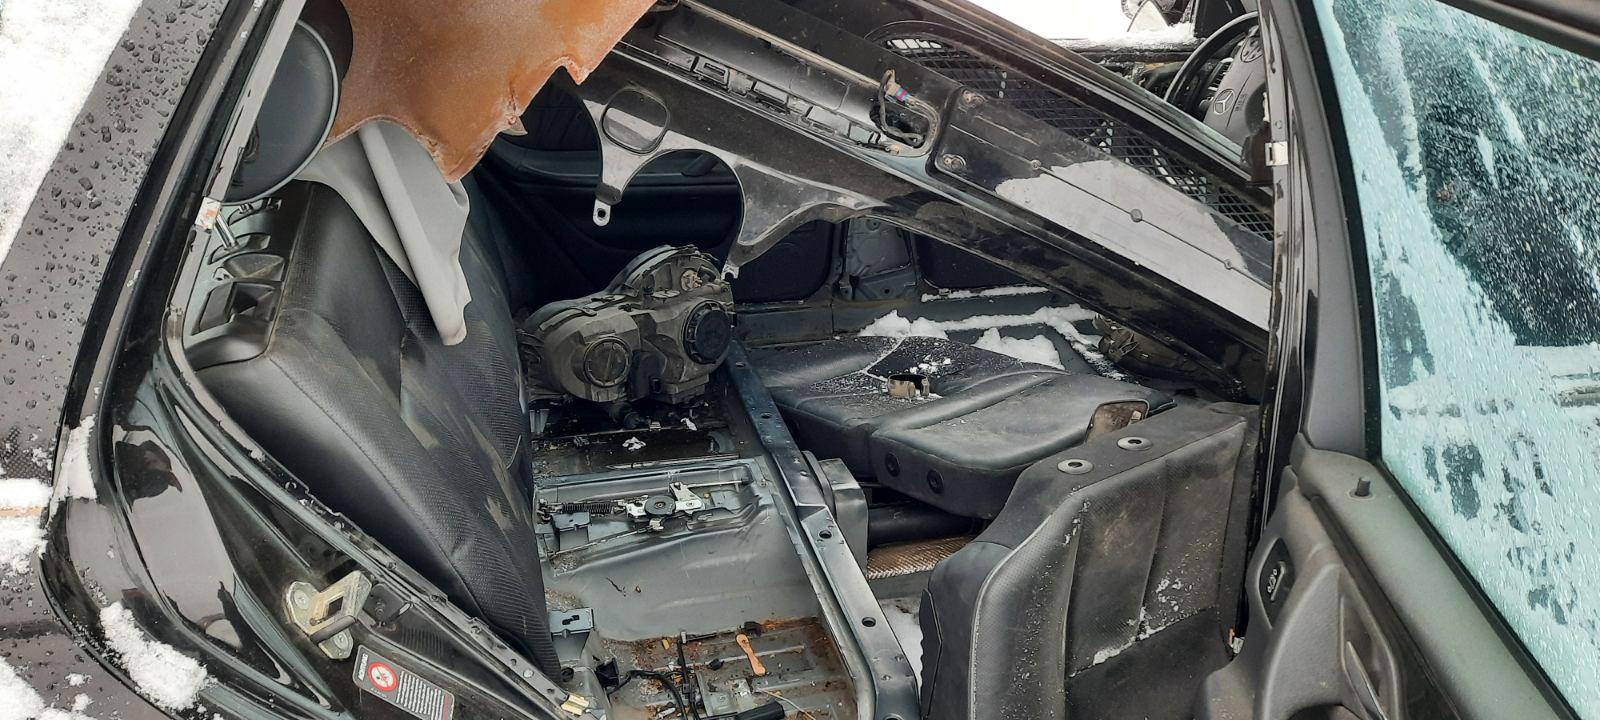 Used Car Parts Foto 4 Mercedes-Benz E-CLASS 2000 0.0 Mechanical Universal 4/5 d. Black 2021-1-12 A6026